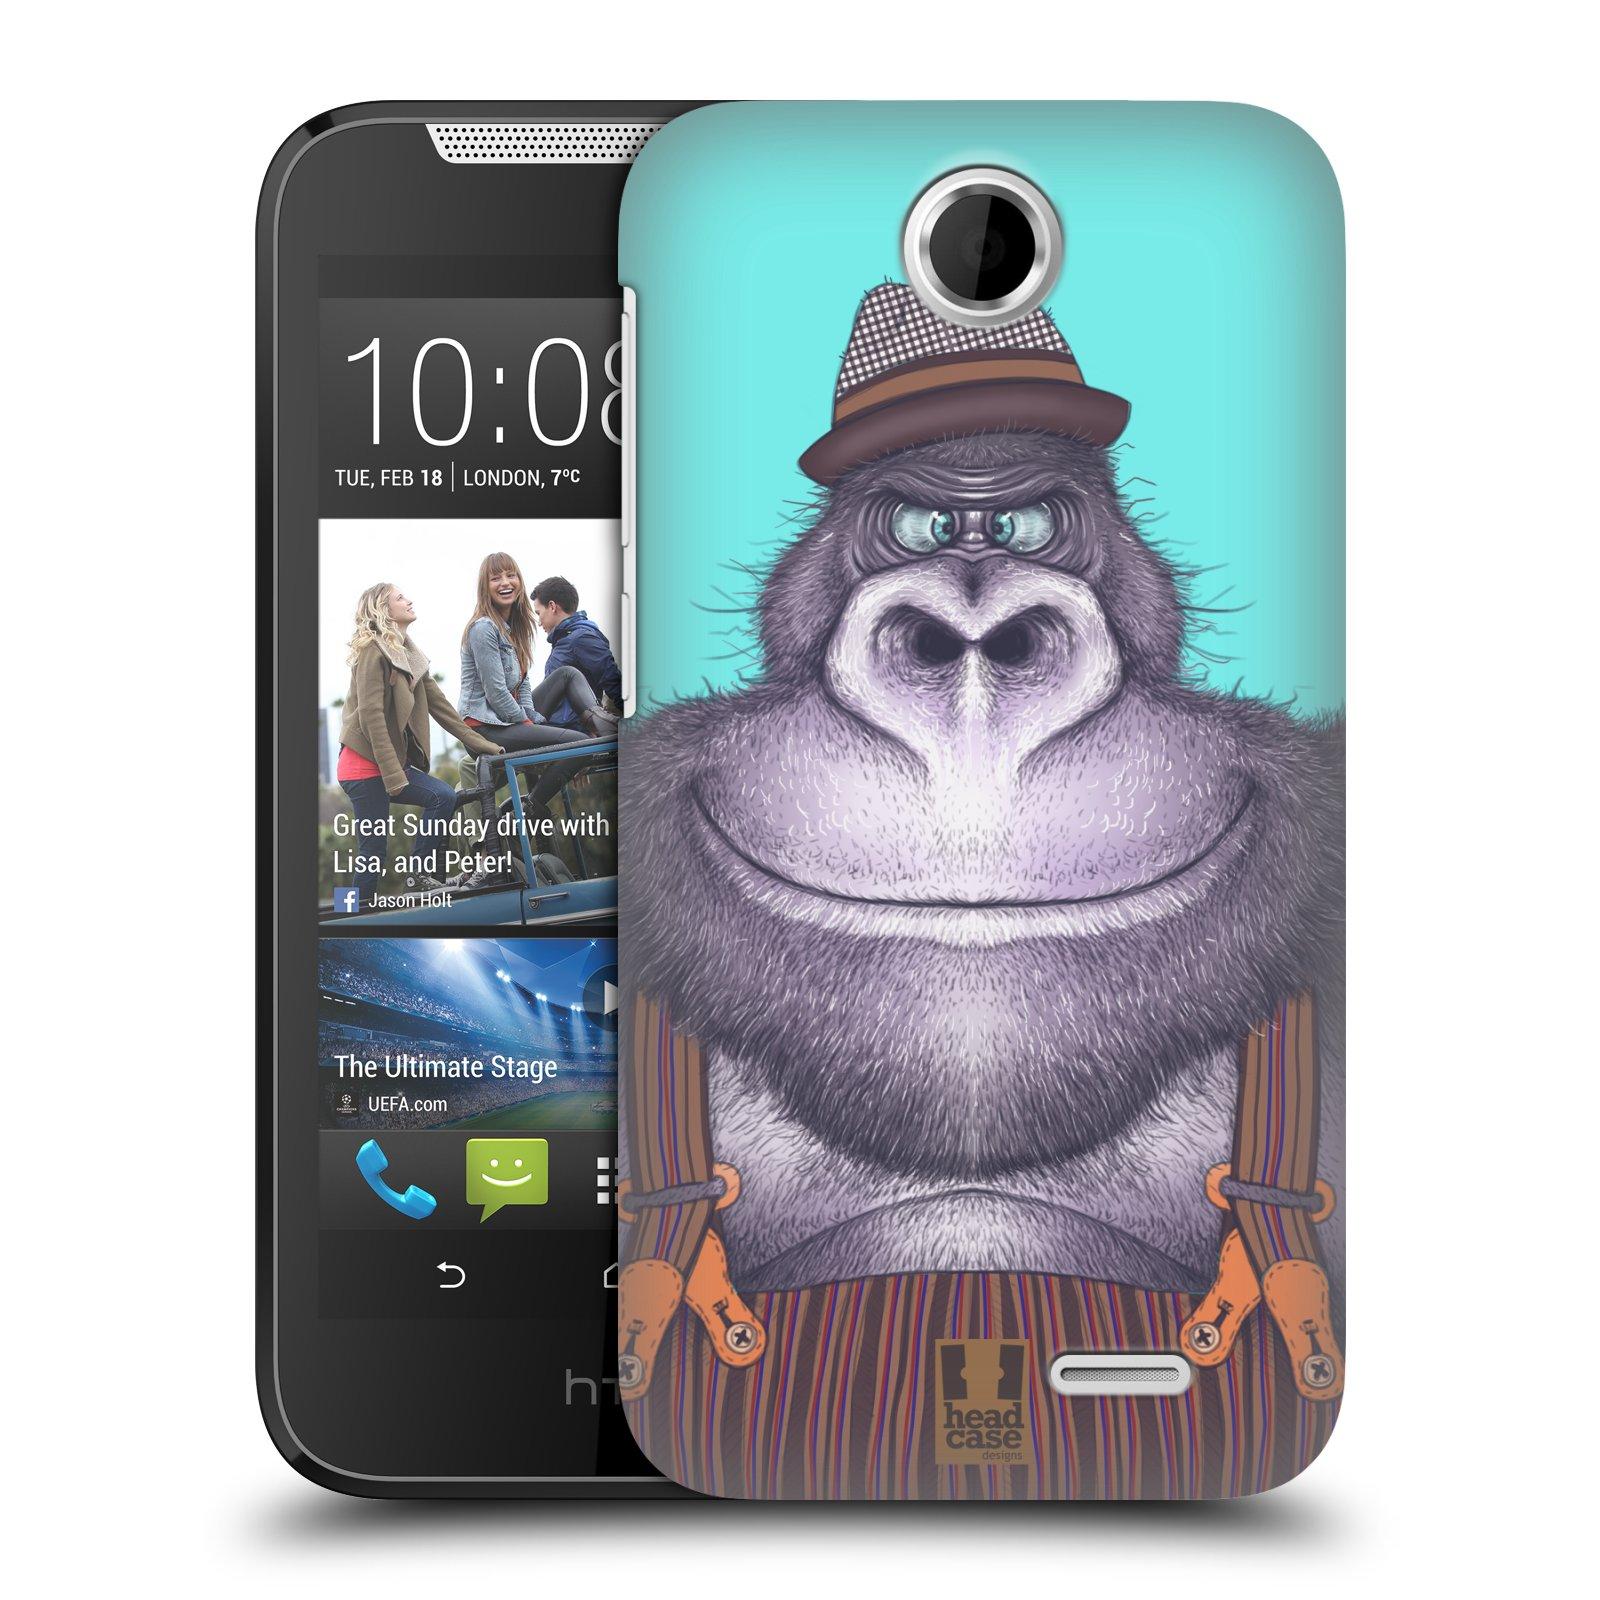 HEAD CASE plastový obal na mobil HTC Desire 310 vzor Kreslená zvířátka gorila